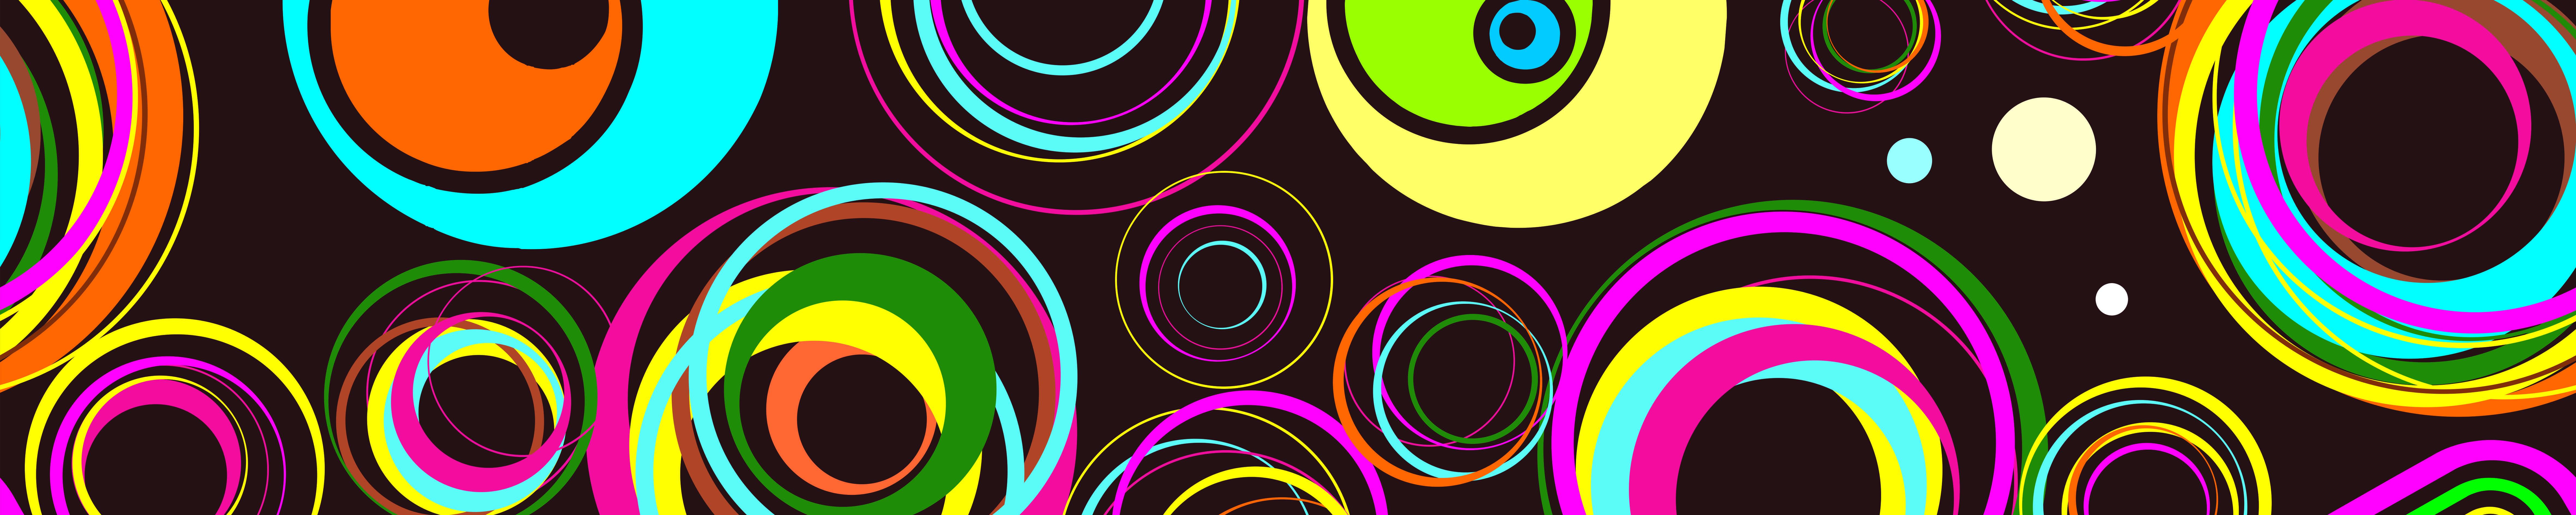 Яркие круги, дизайн #05933